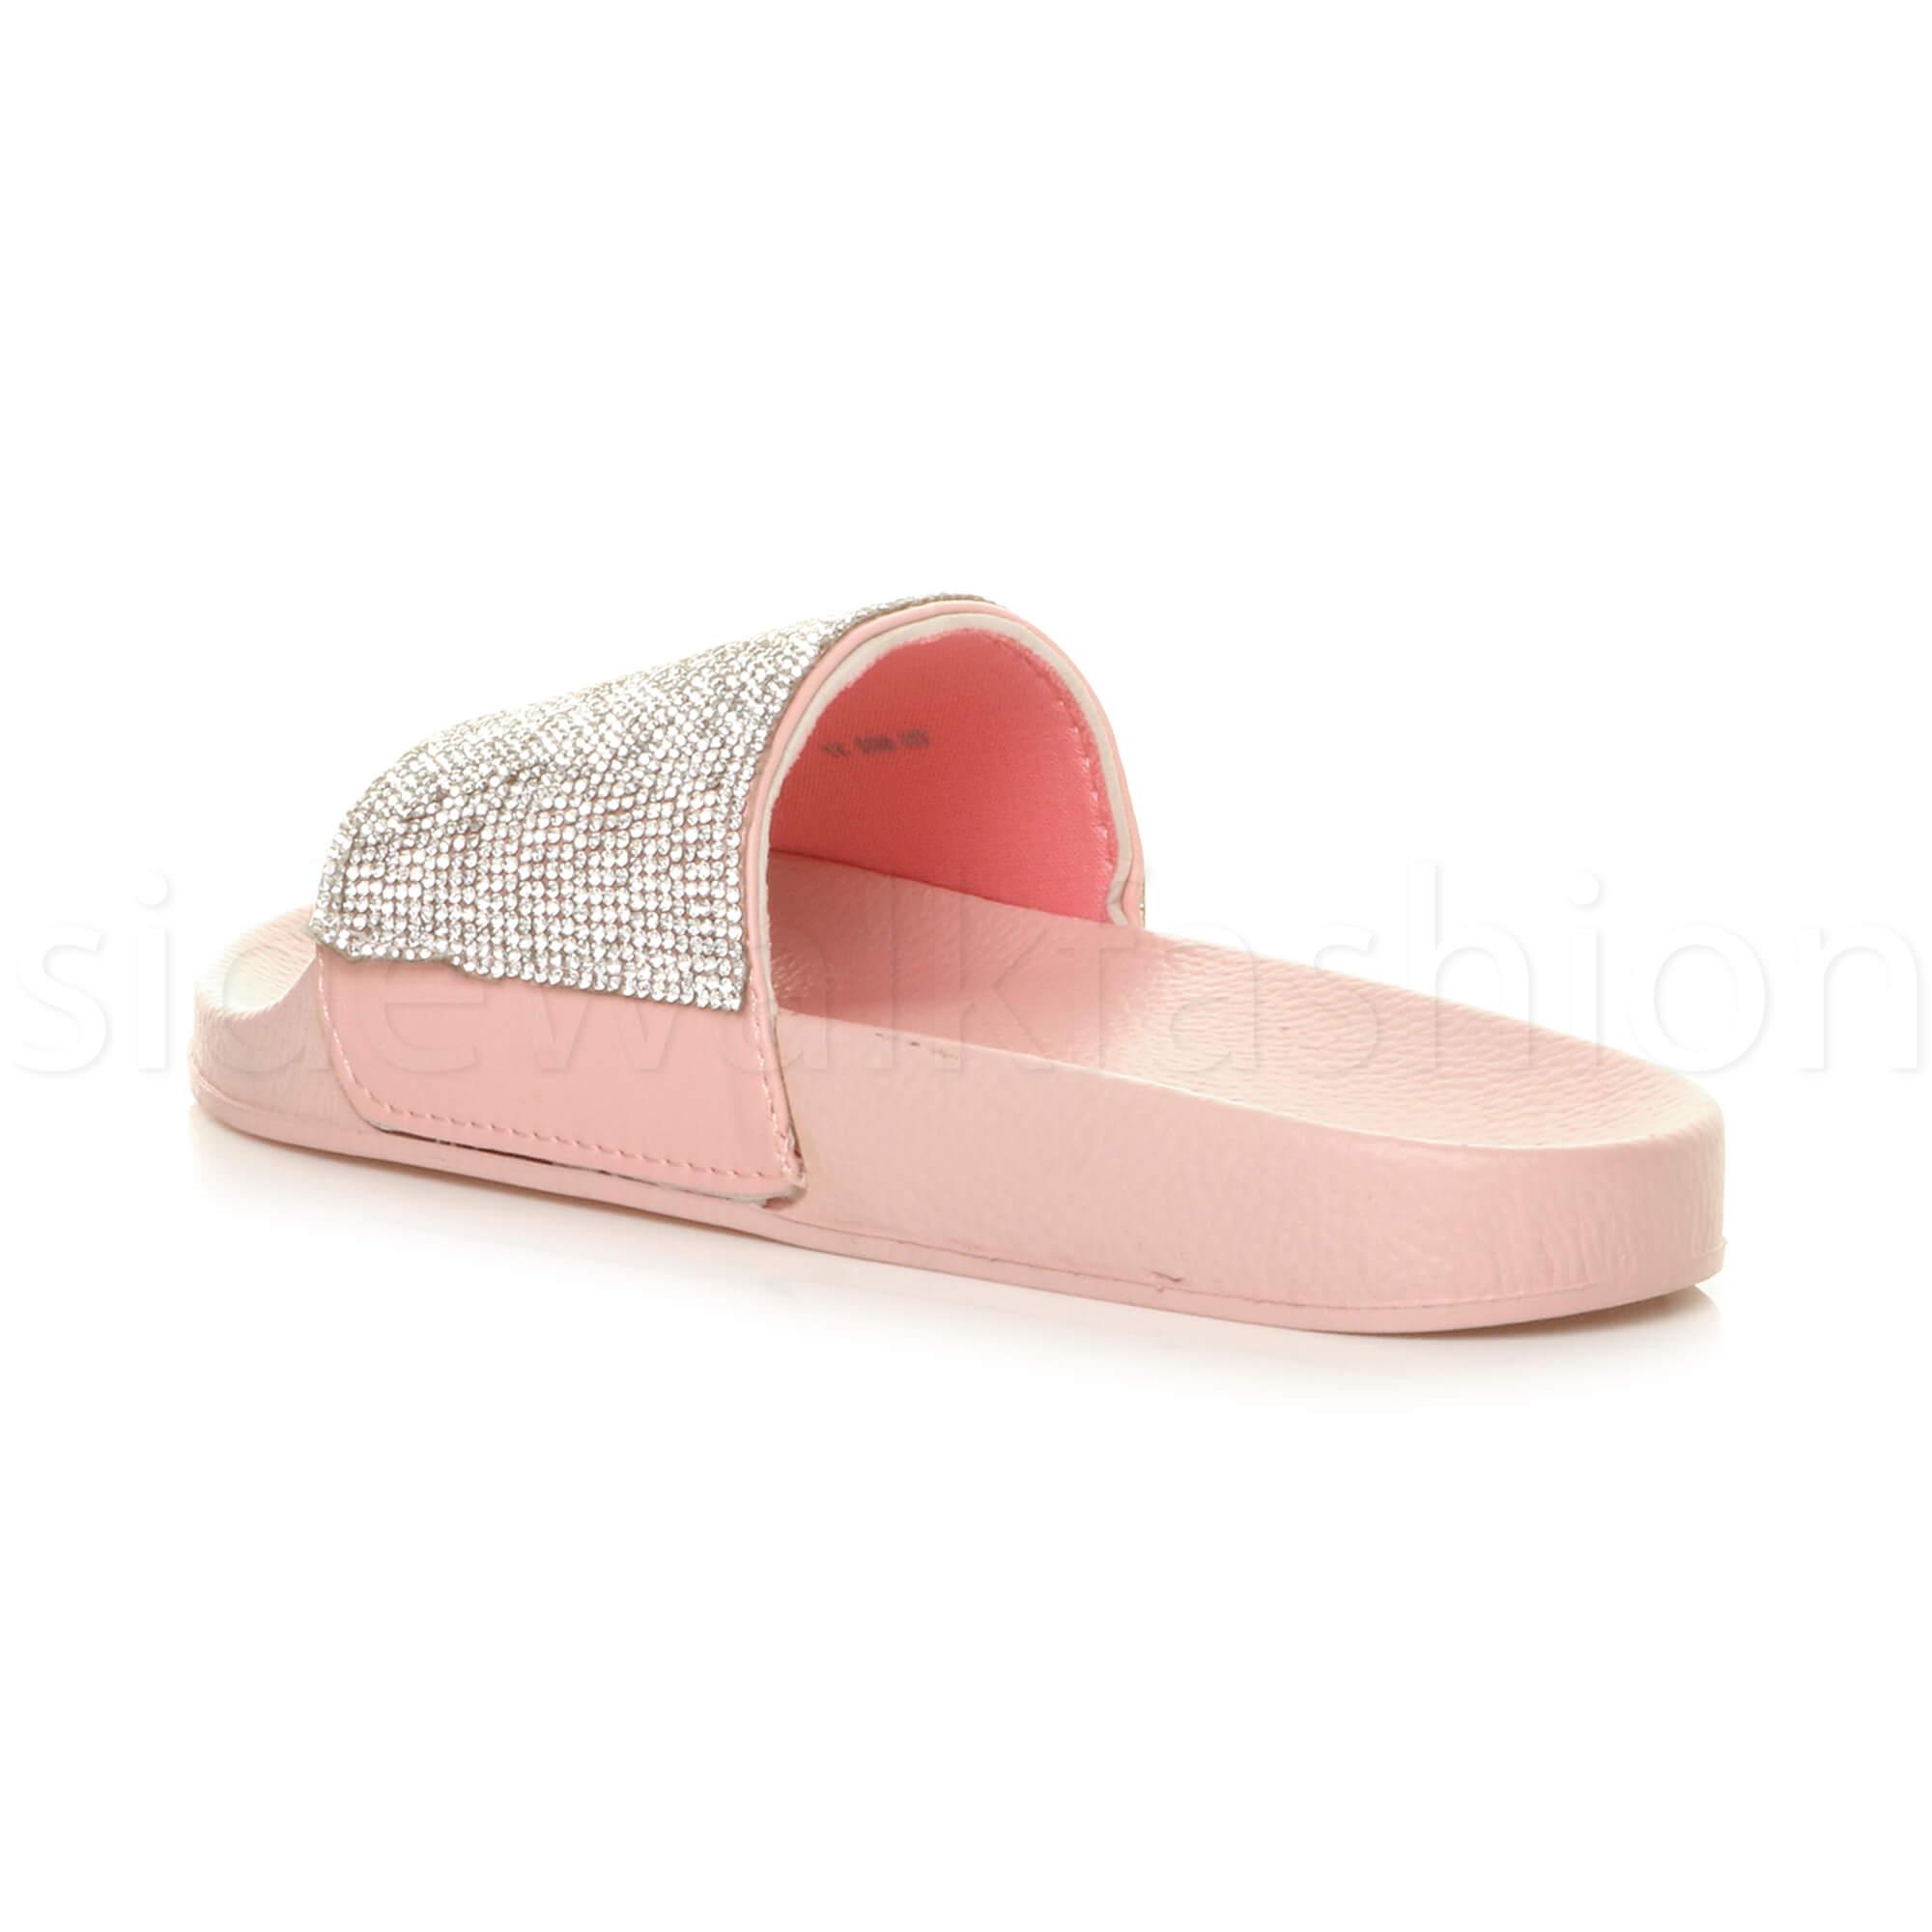 Womens-ladies-flat-slip-on-sparkly-summer-diamante-sandals-flip-flops-sliders